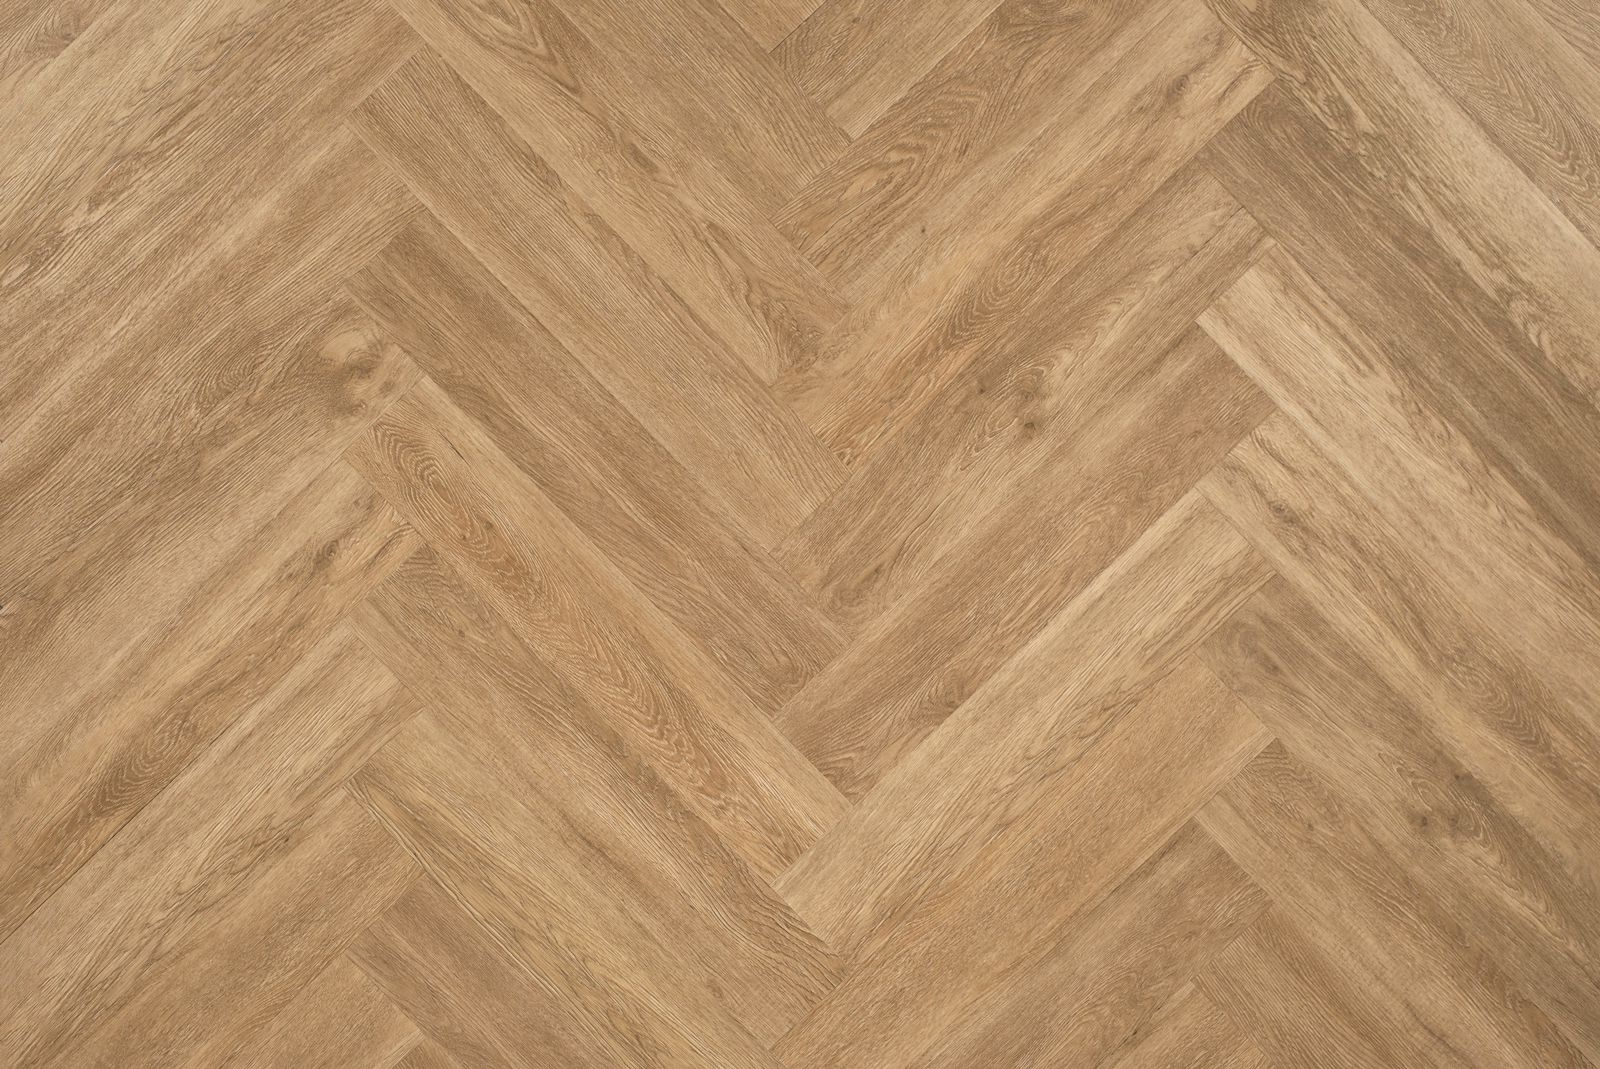 Pvc Visgraat Leggen : Floer visgraat pvc vloeren warm bruin eiken cm vloer